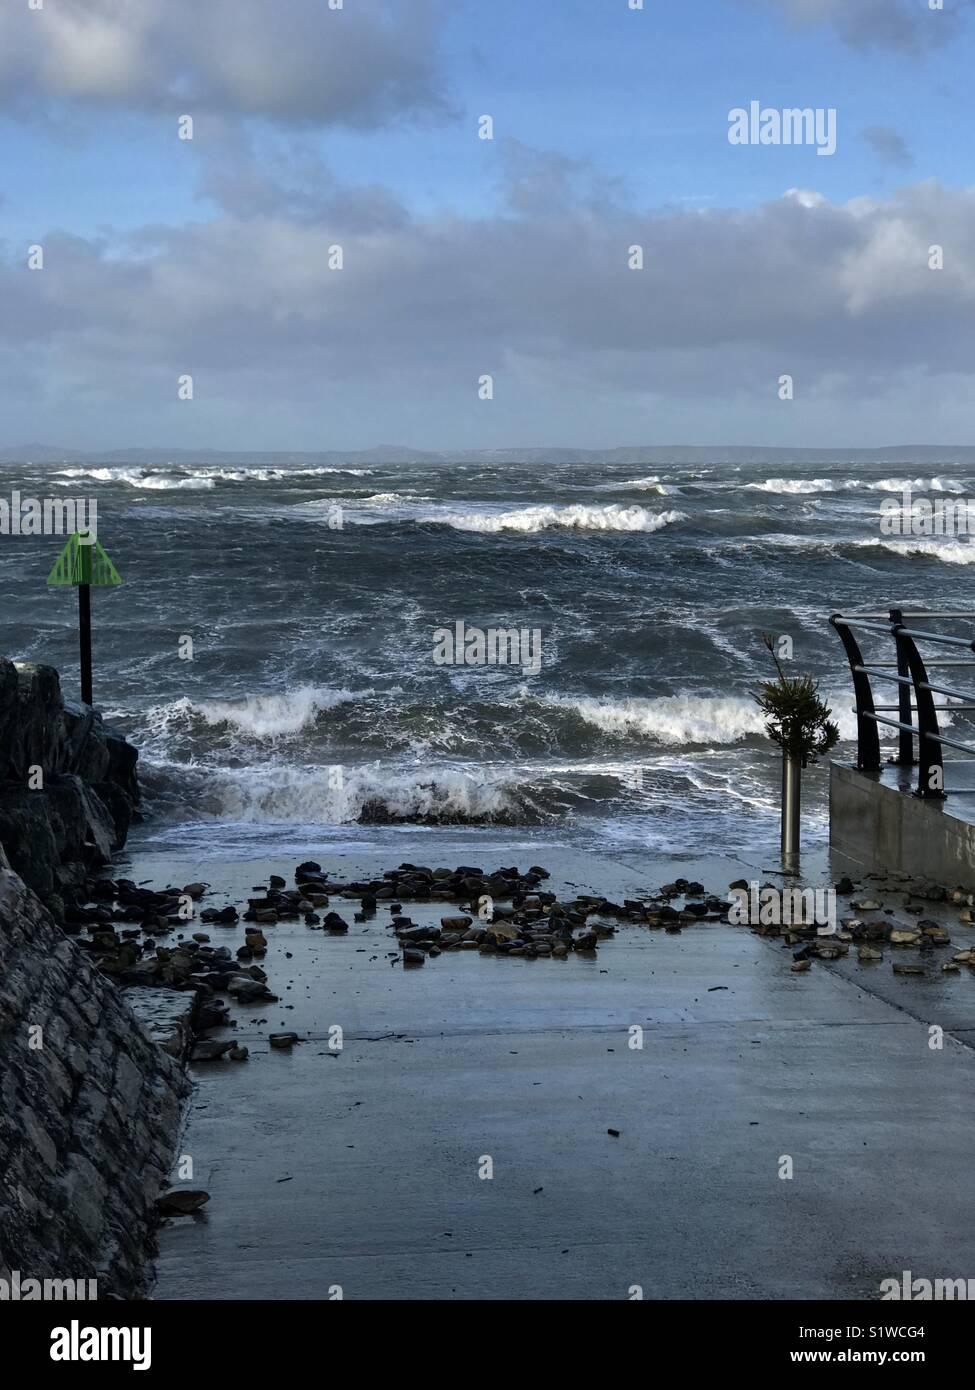 Stormy seas, Little Haven, Pembrokeshire - Stock Image